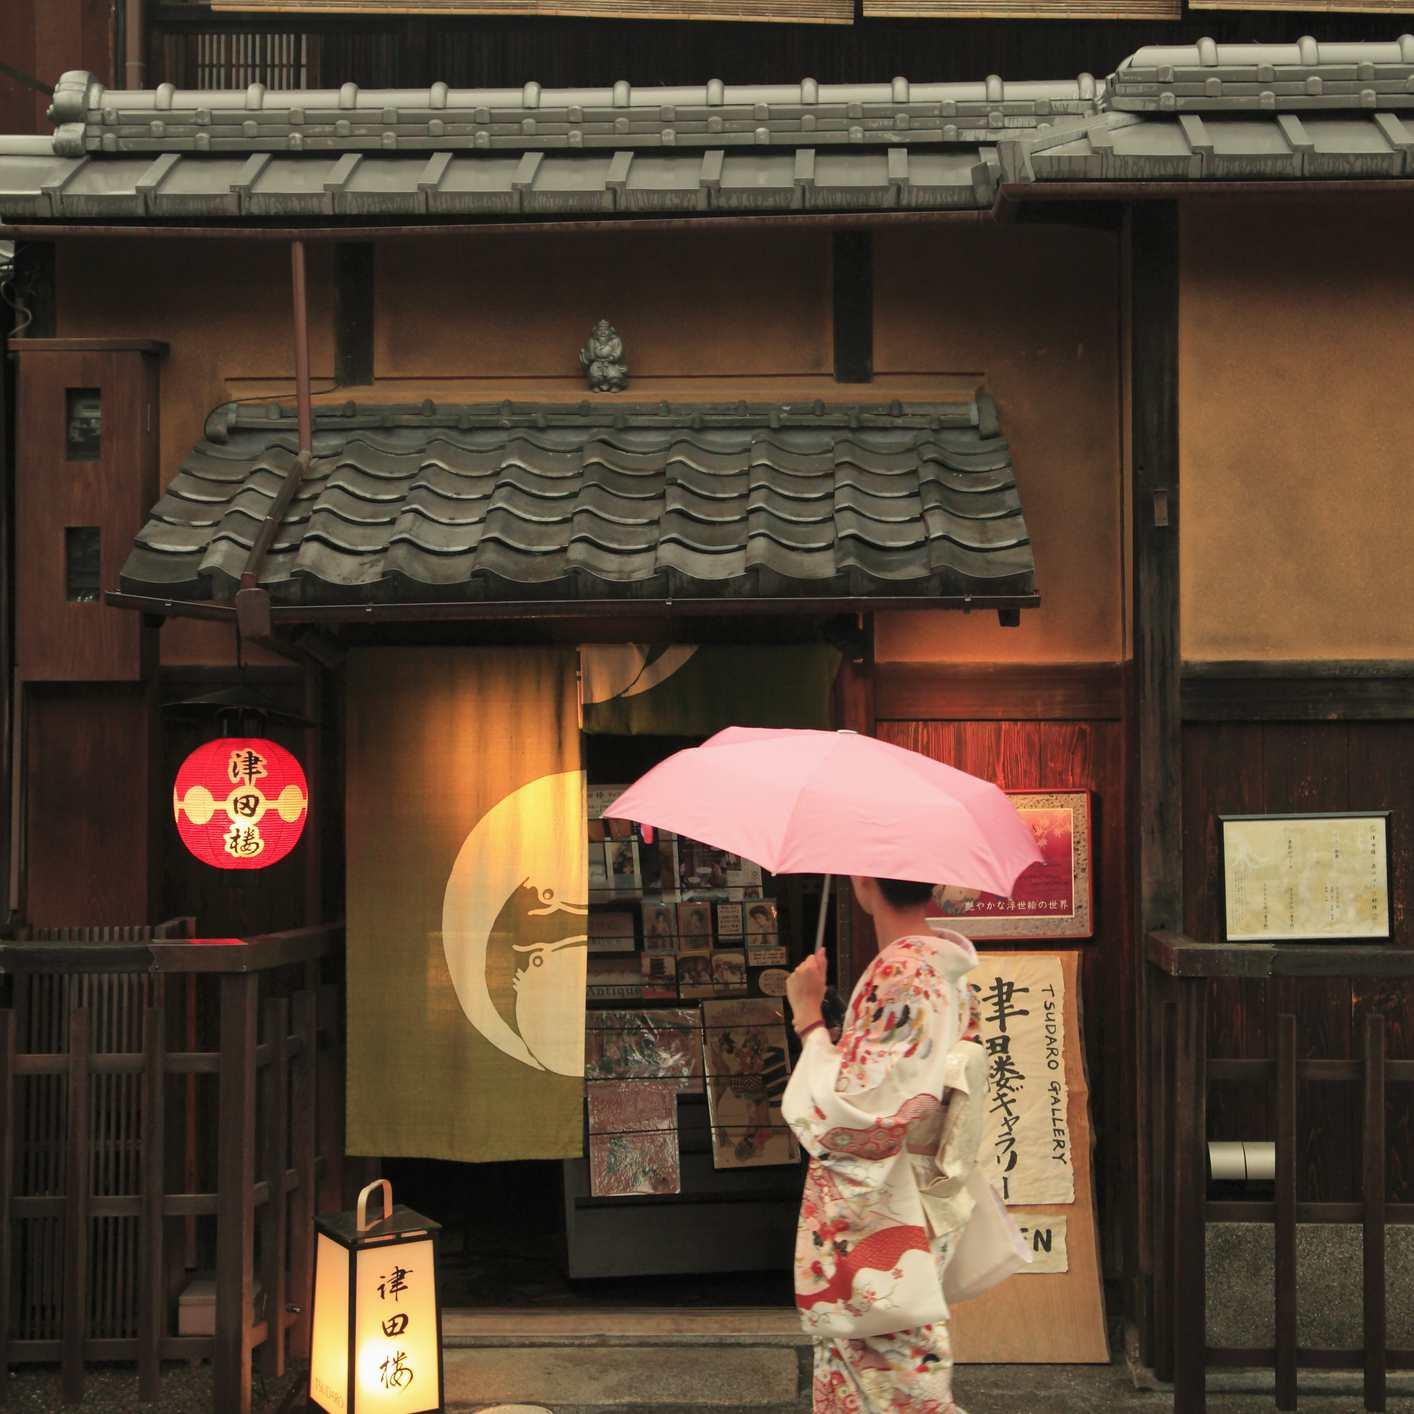 Japan, Kyoto, Gion, street scene, geisha,